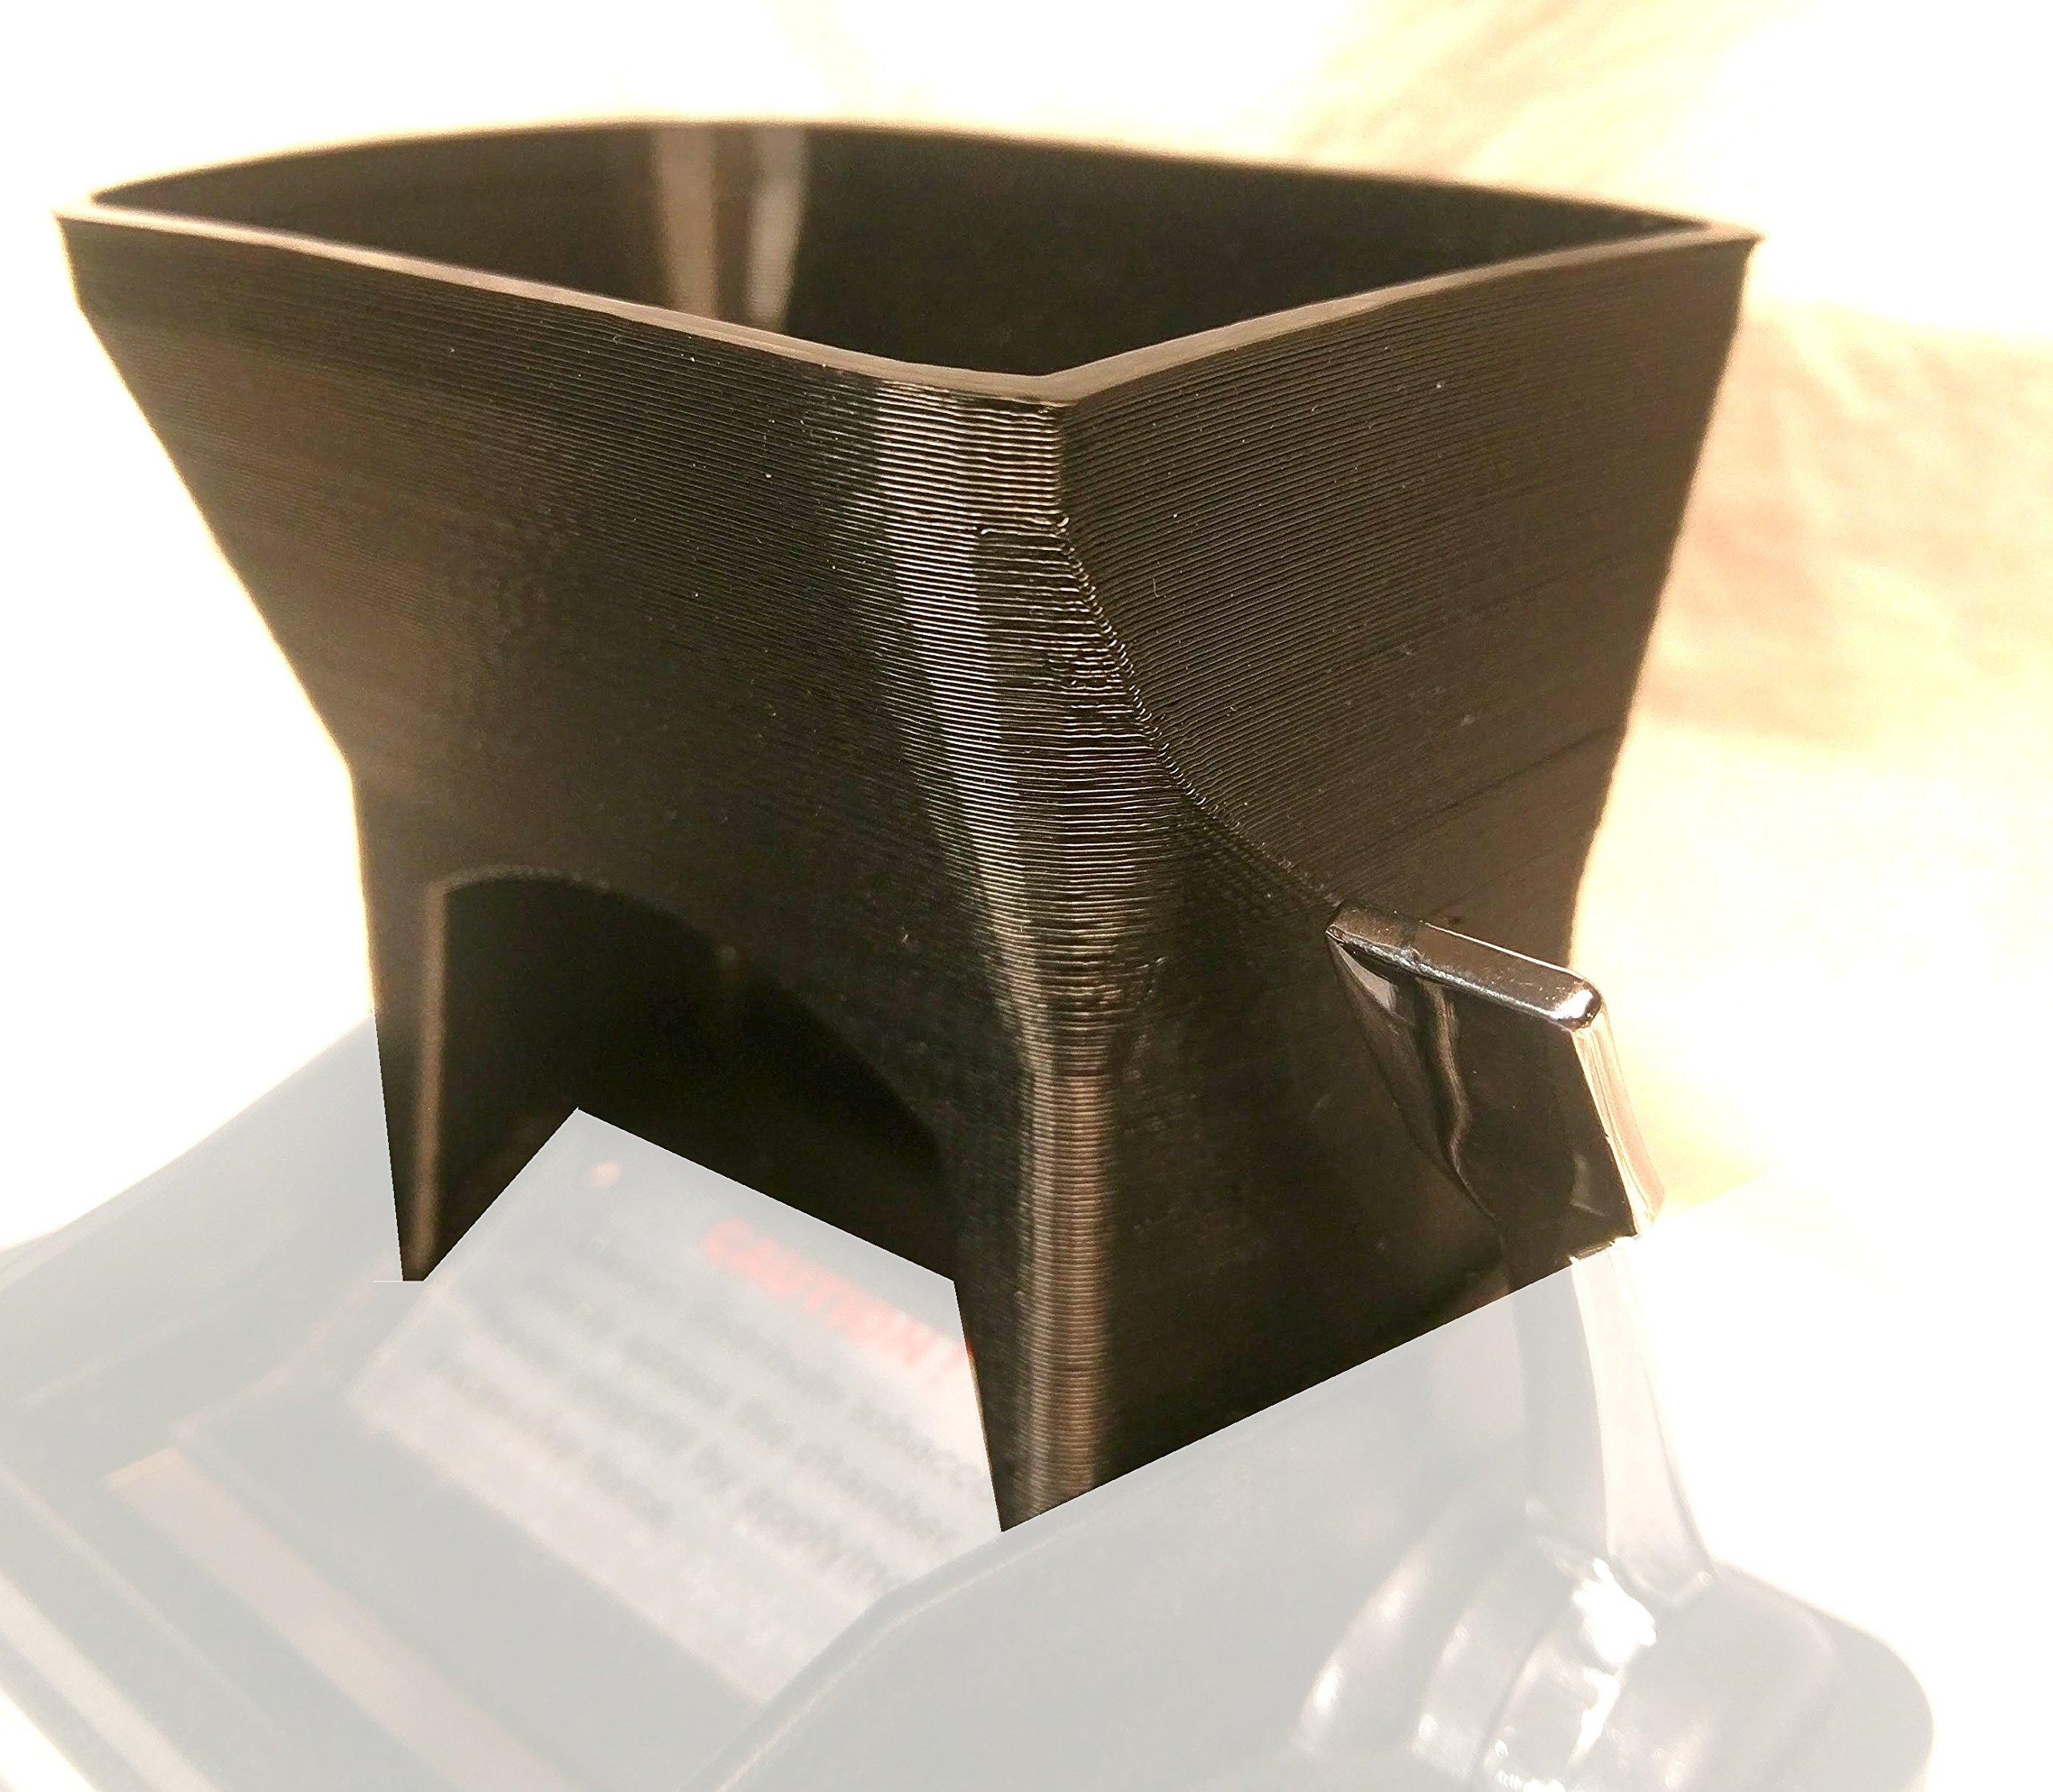 Ergo 3D Tobacco Hopper for Powermatic 2 and 2+ Cigarette Rolling Machine